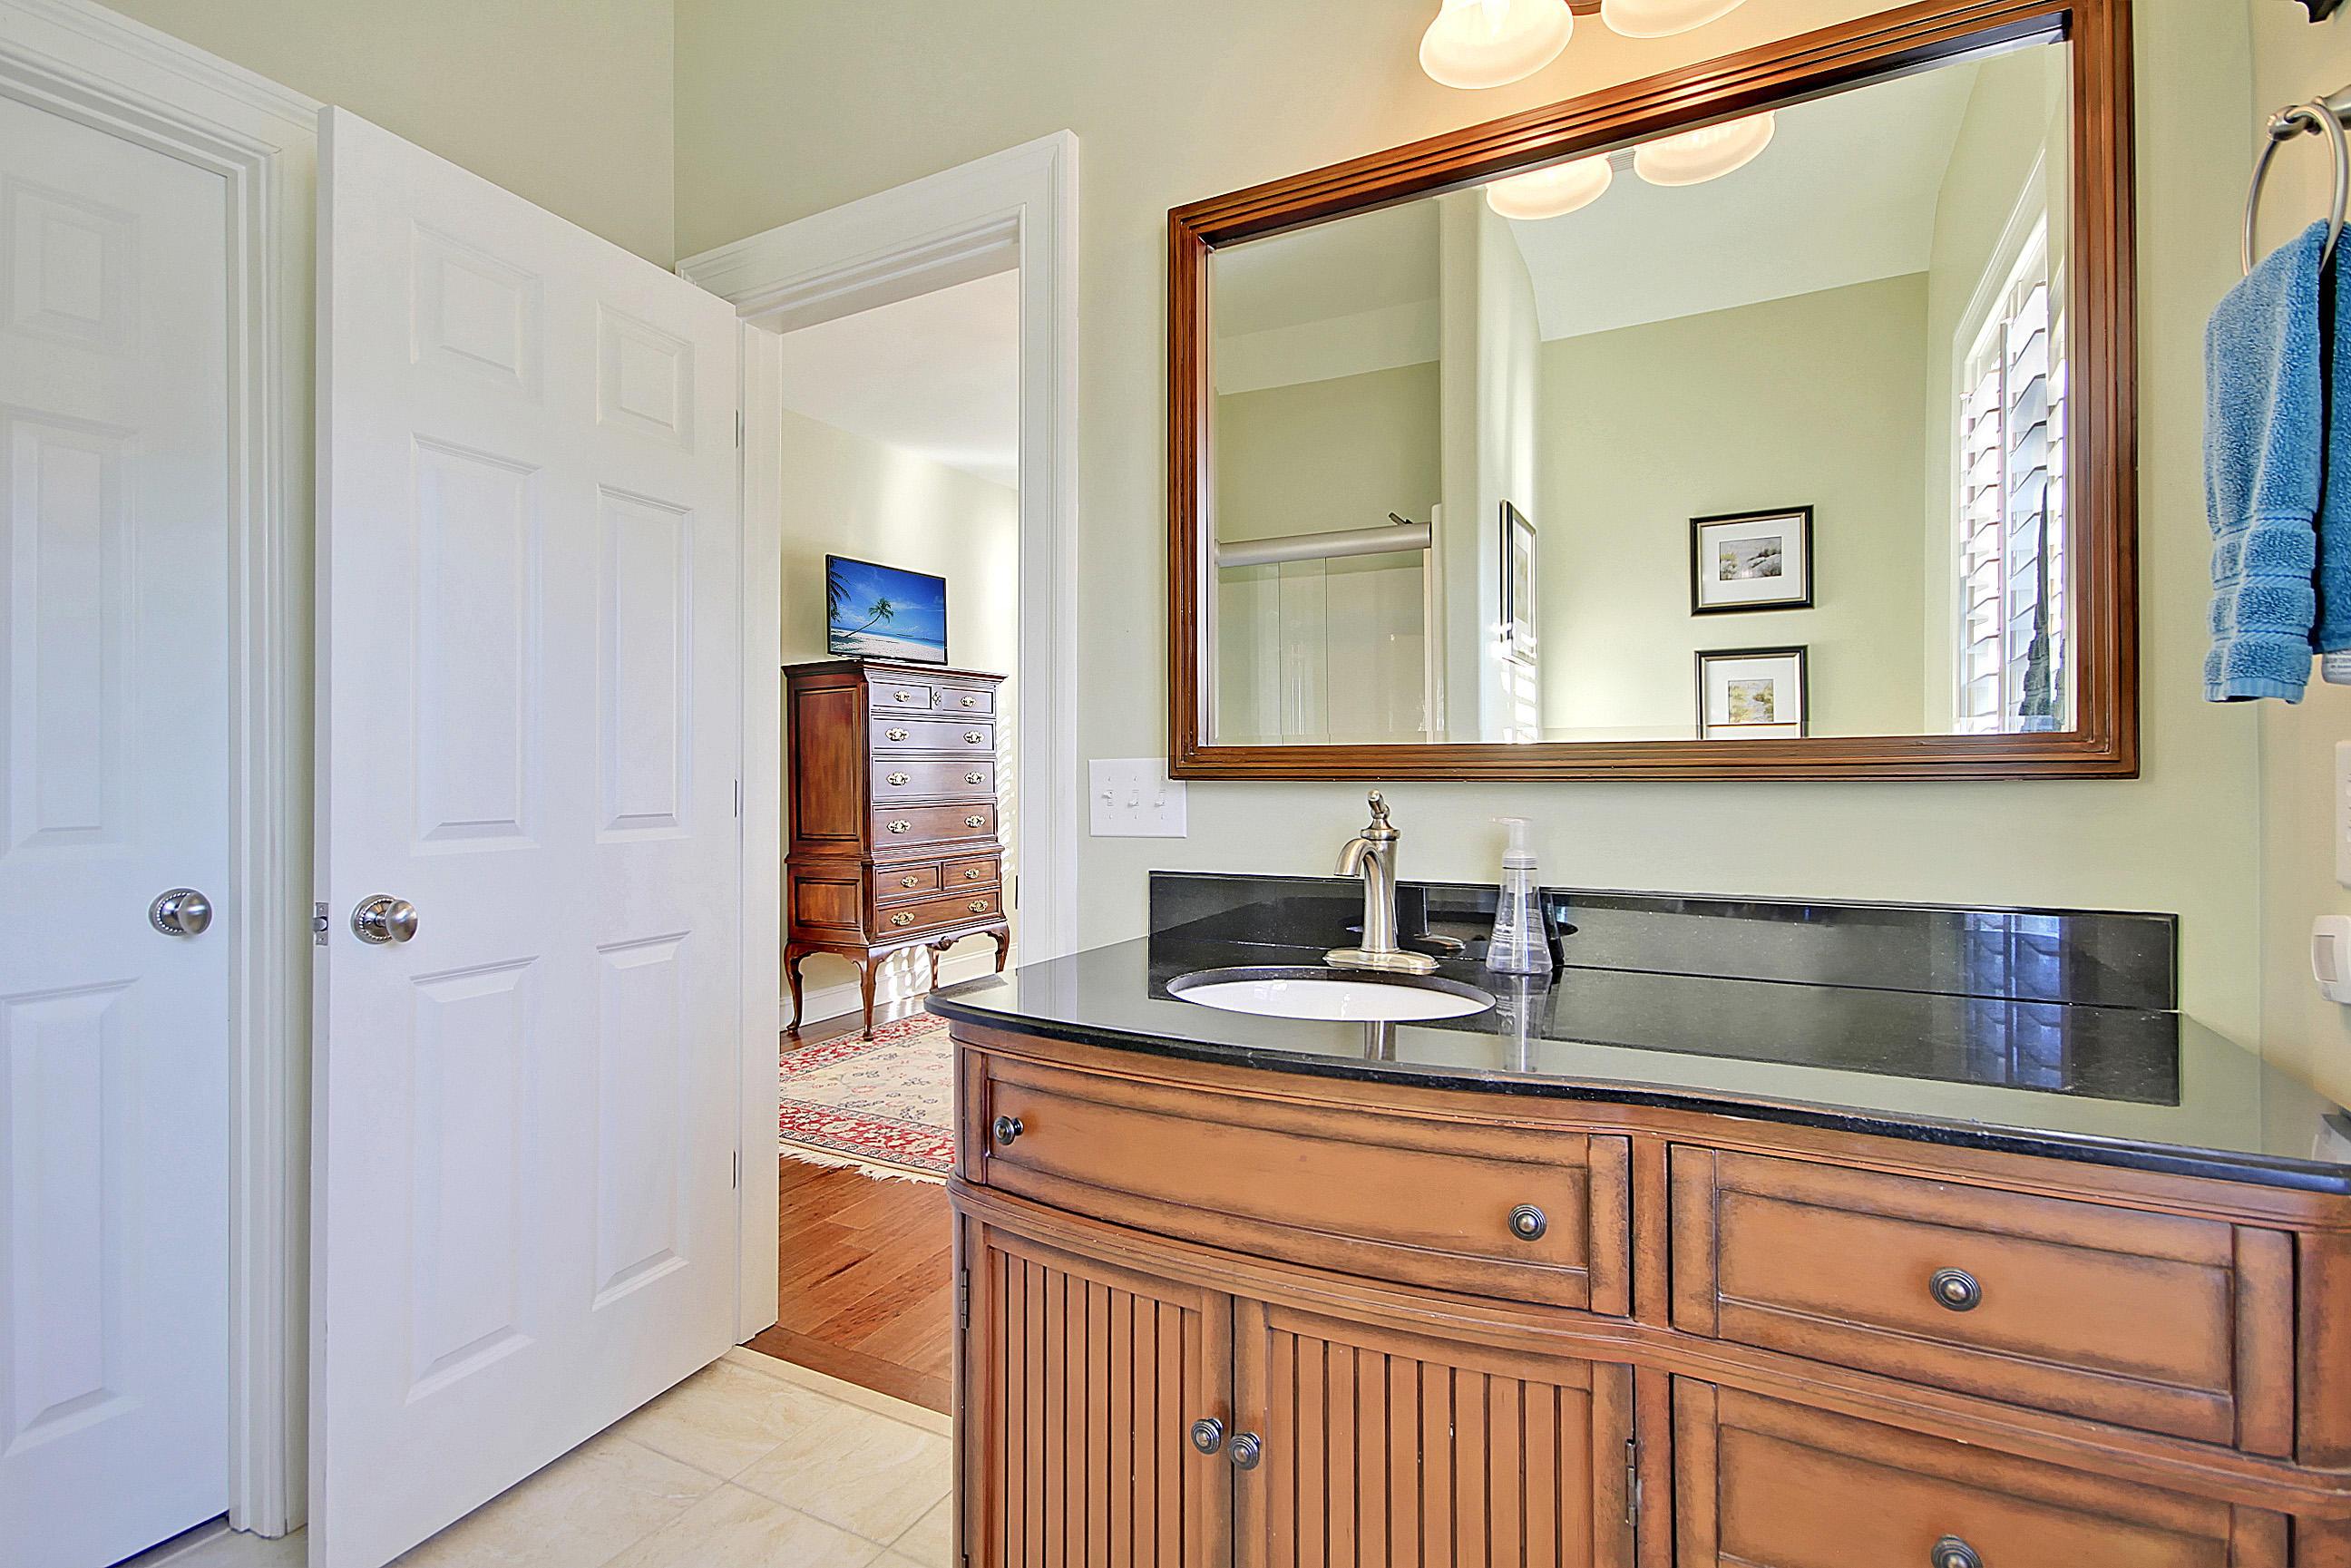 Rivertowne Country Club Homes For Sale - 2601 Kiln Creek, Mount Pleasant, SC - 52